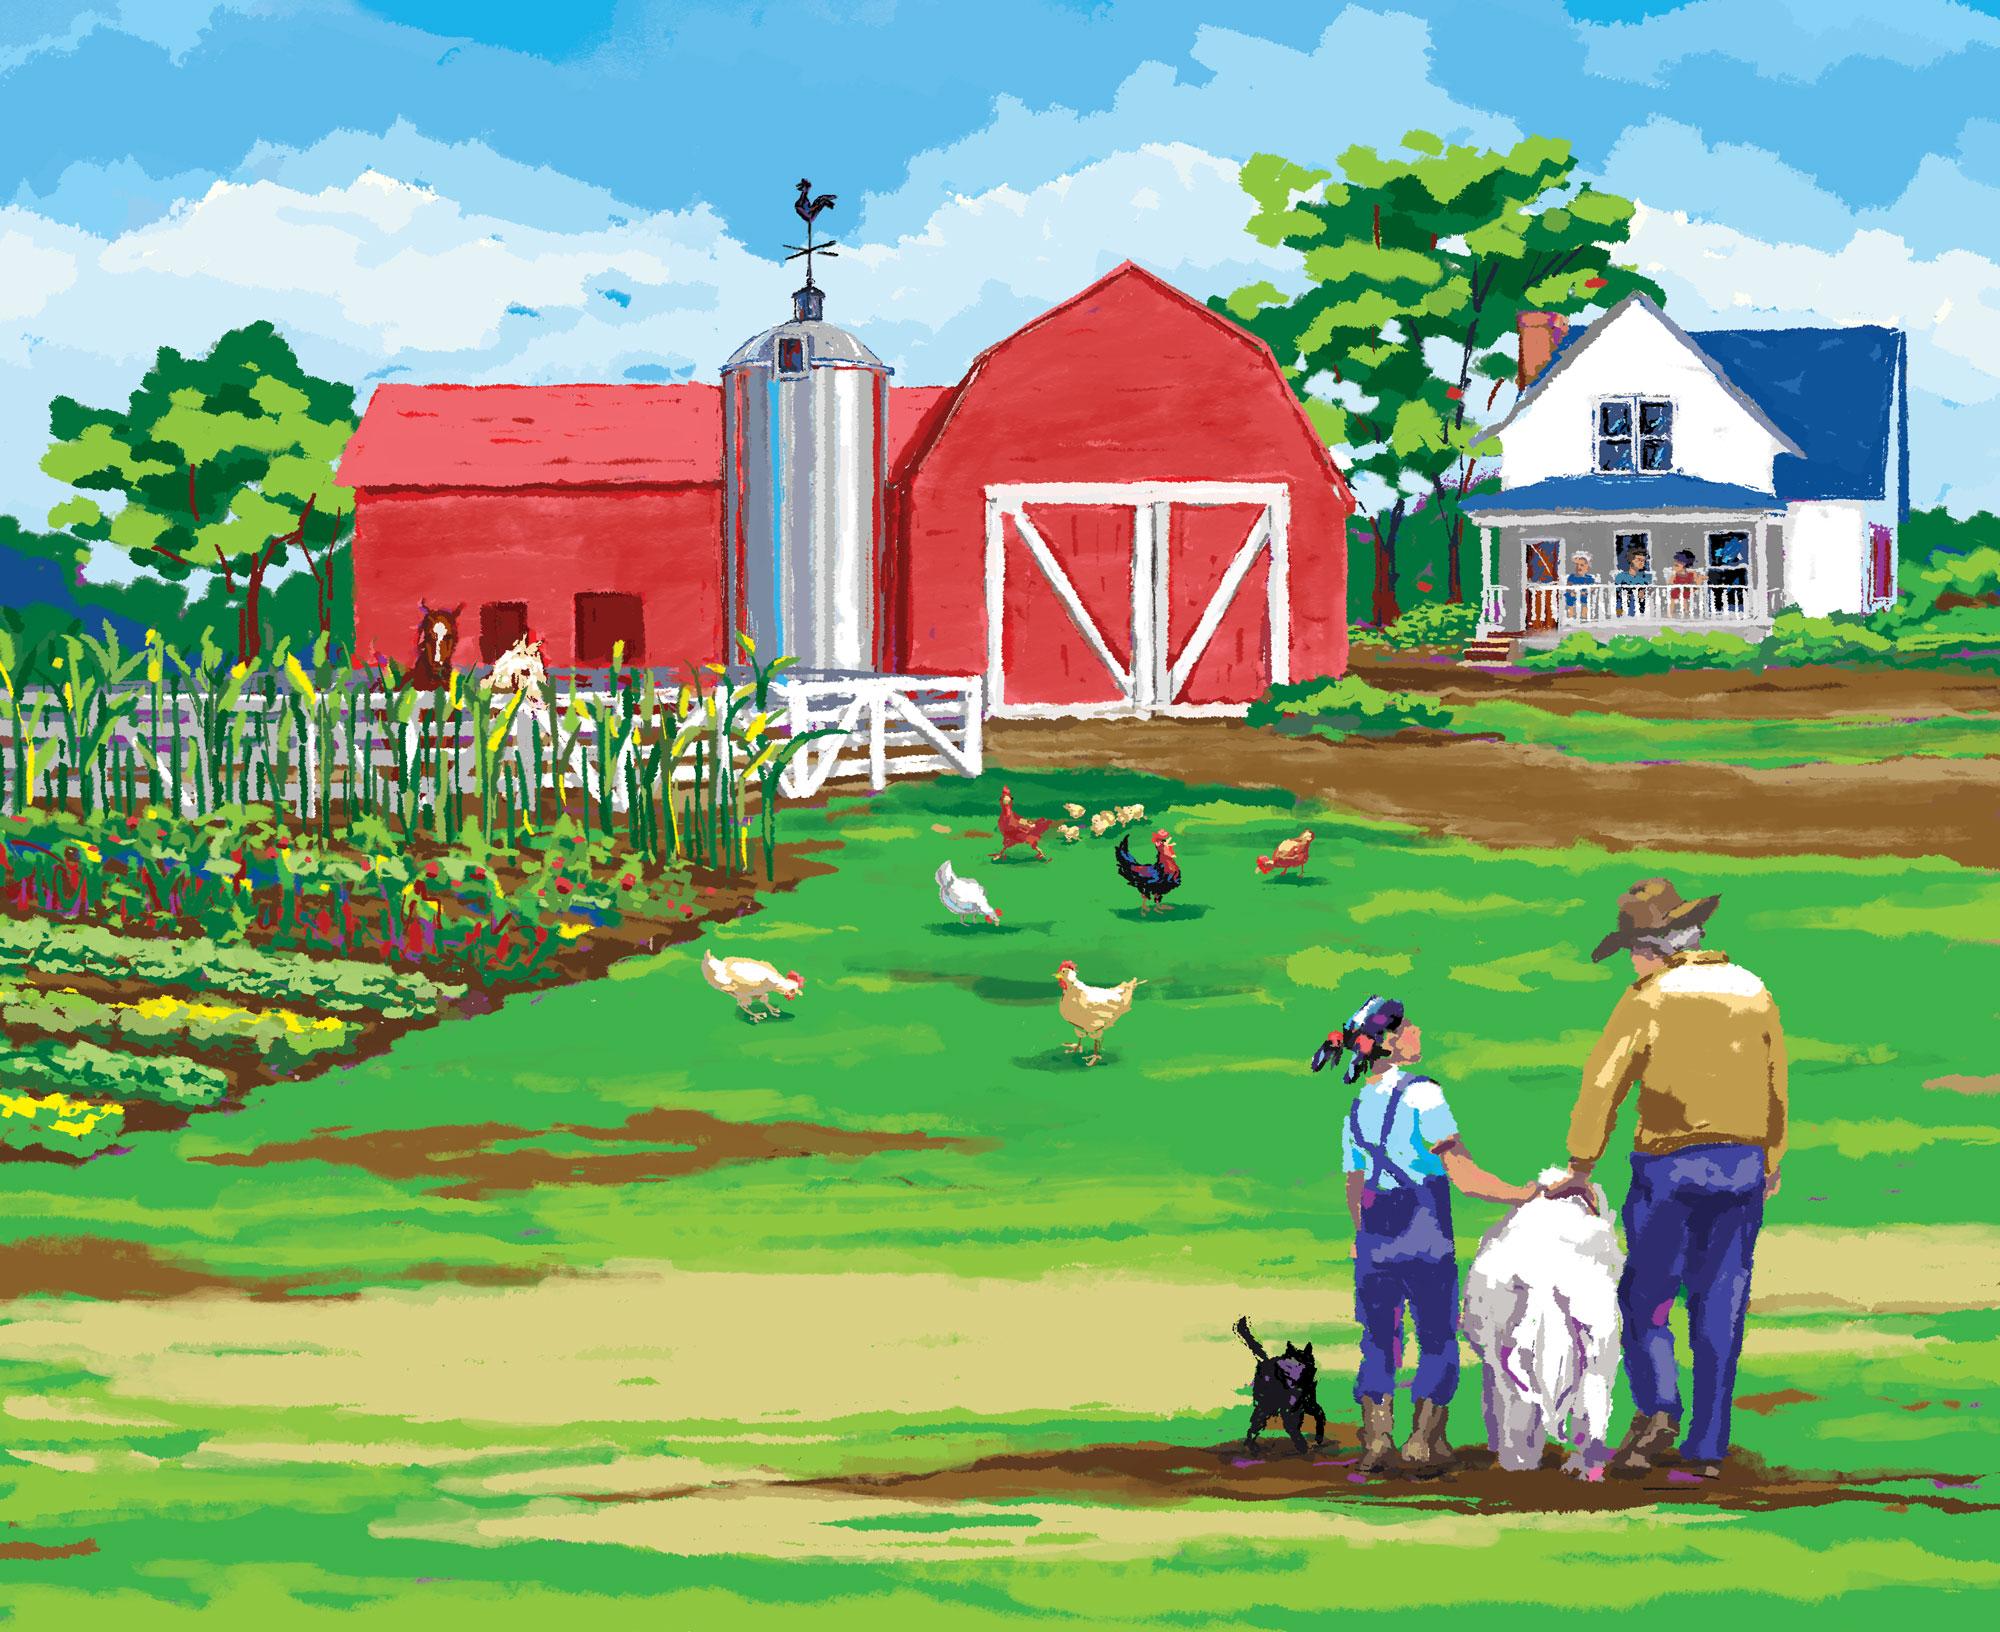 Kate and Grandpa at the Farm